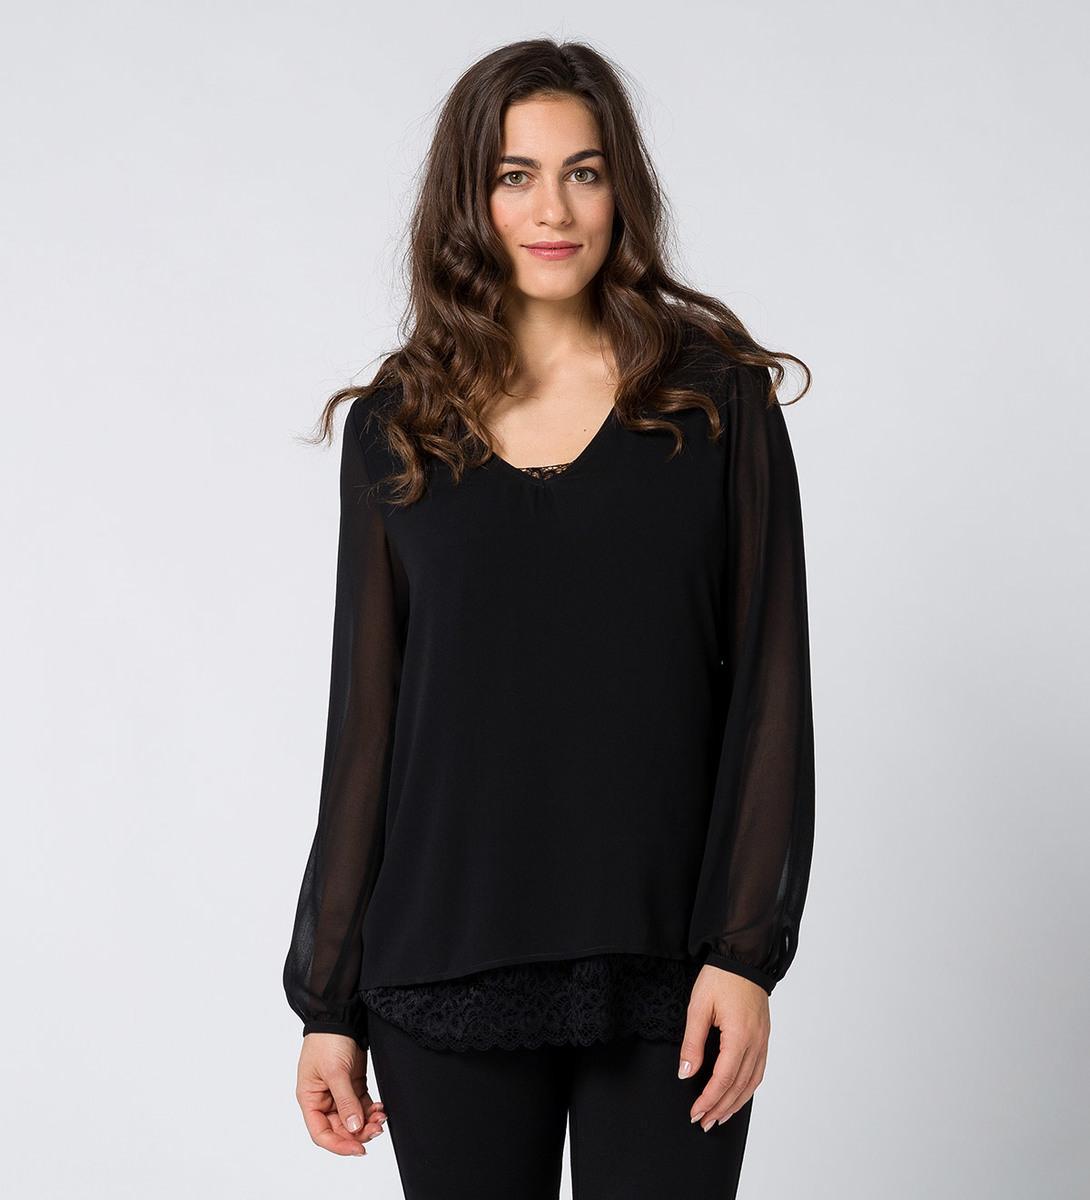 Bluse mit integriertem Top black